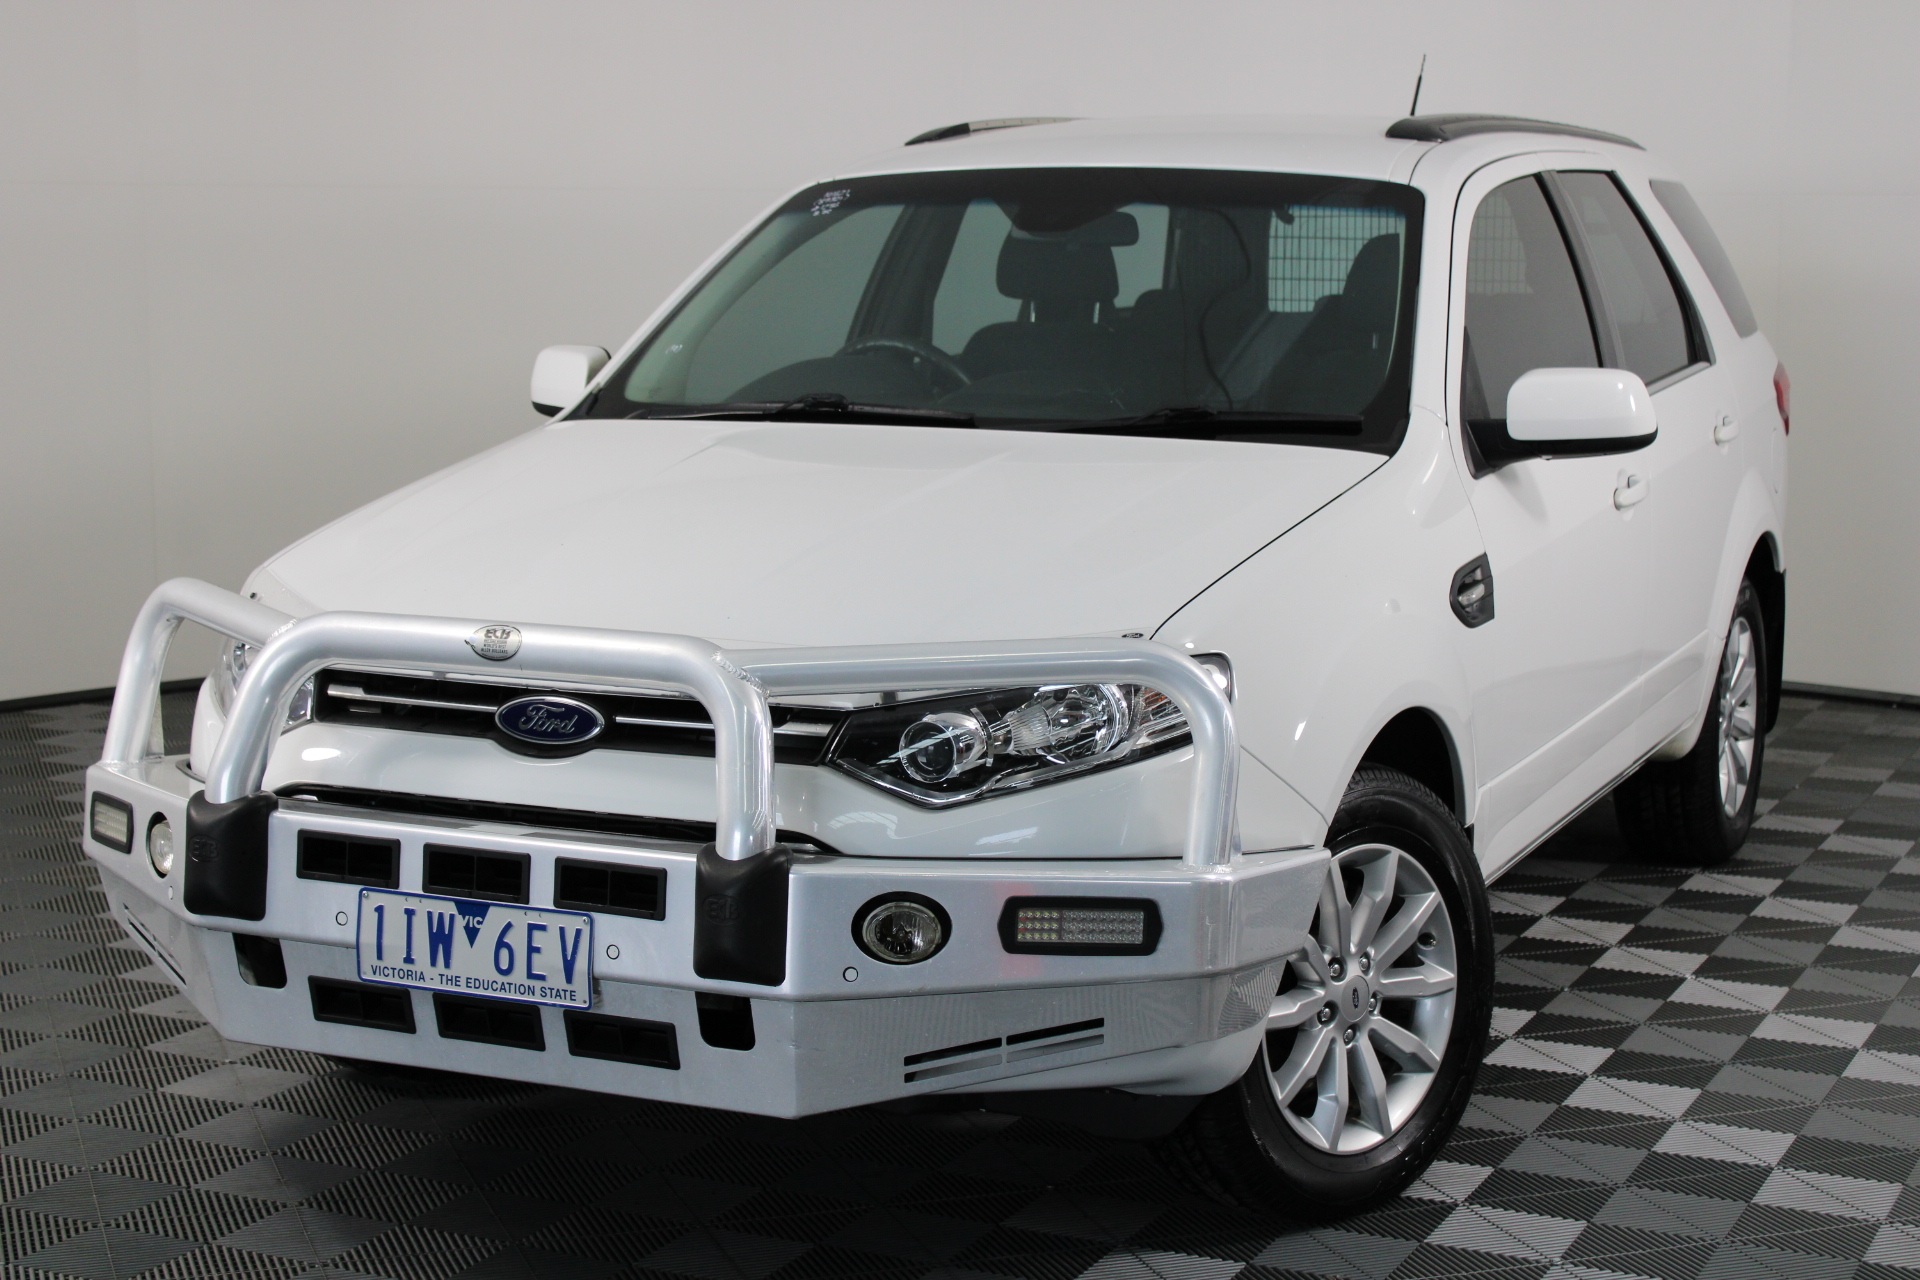 2016 Ford Territory TX (RWD) SZ II Turbo Diesel Automatic Wagon